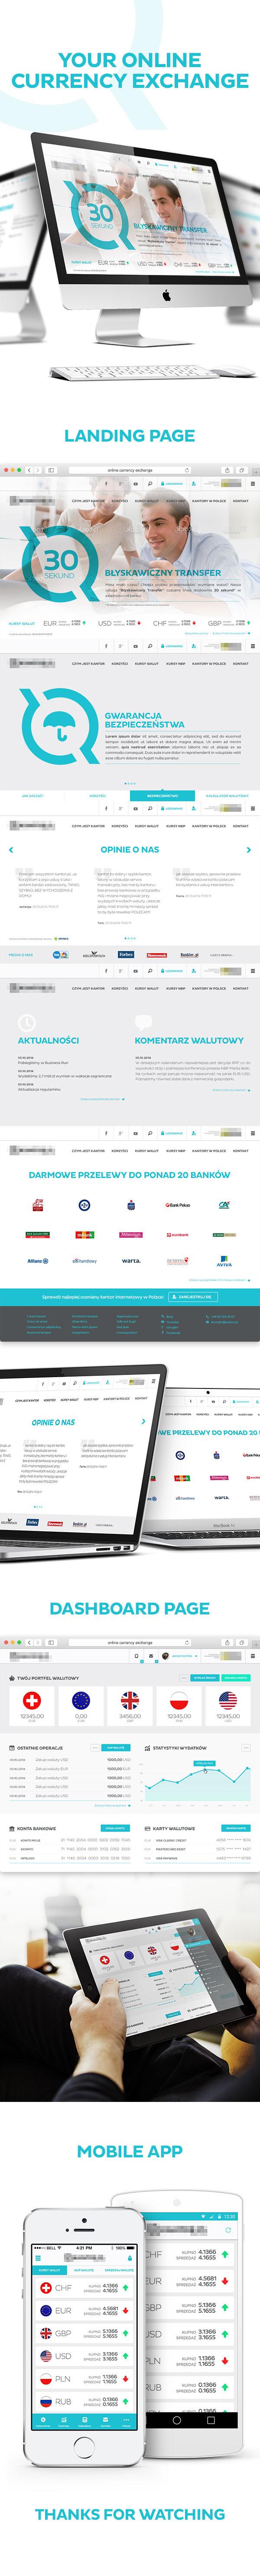 exchange online flat design flat Mobile app dashnoard application usd TRANSFER